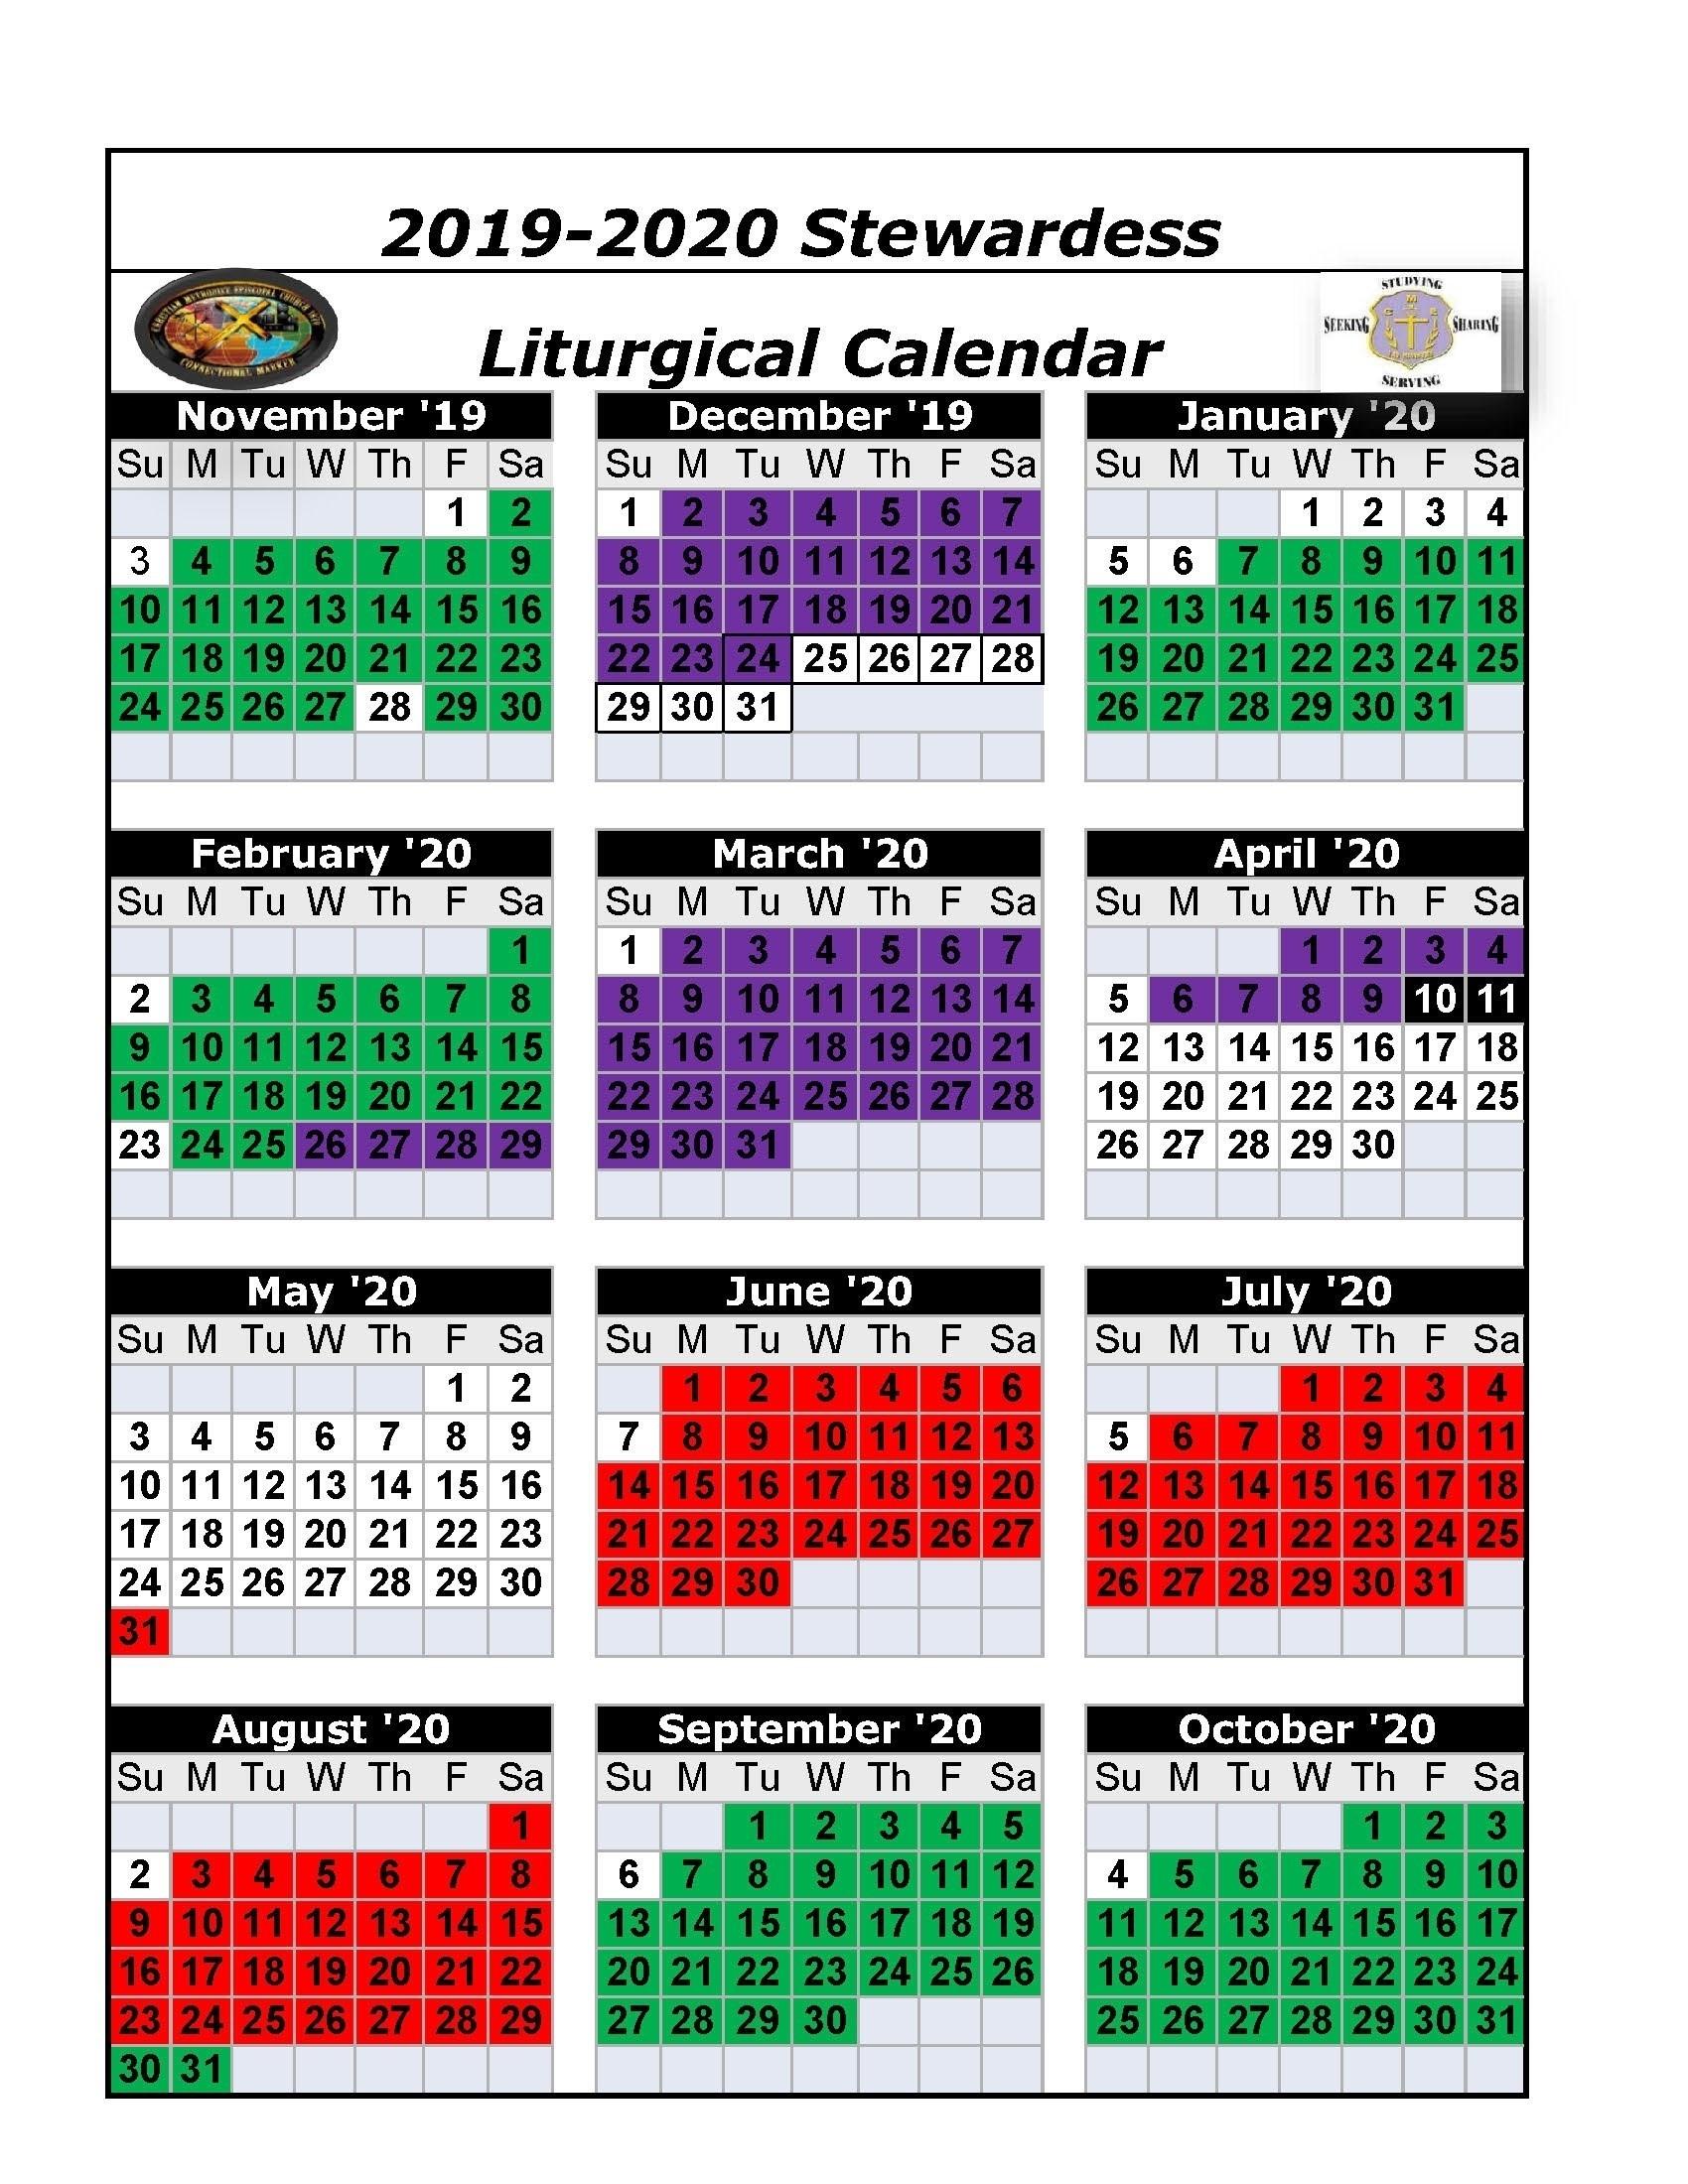 Liturgical Year Worksheet | Printable Worksheets And  Seasons Of The Methodist Liturgical Calendar